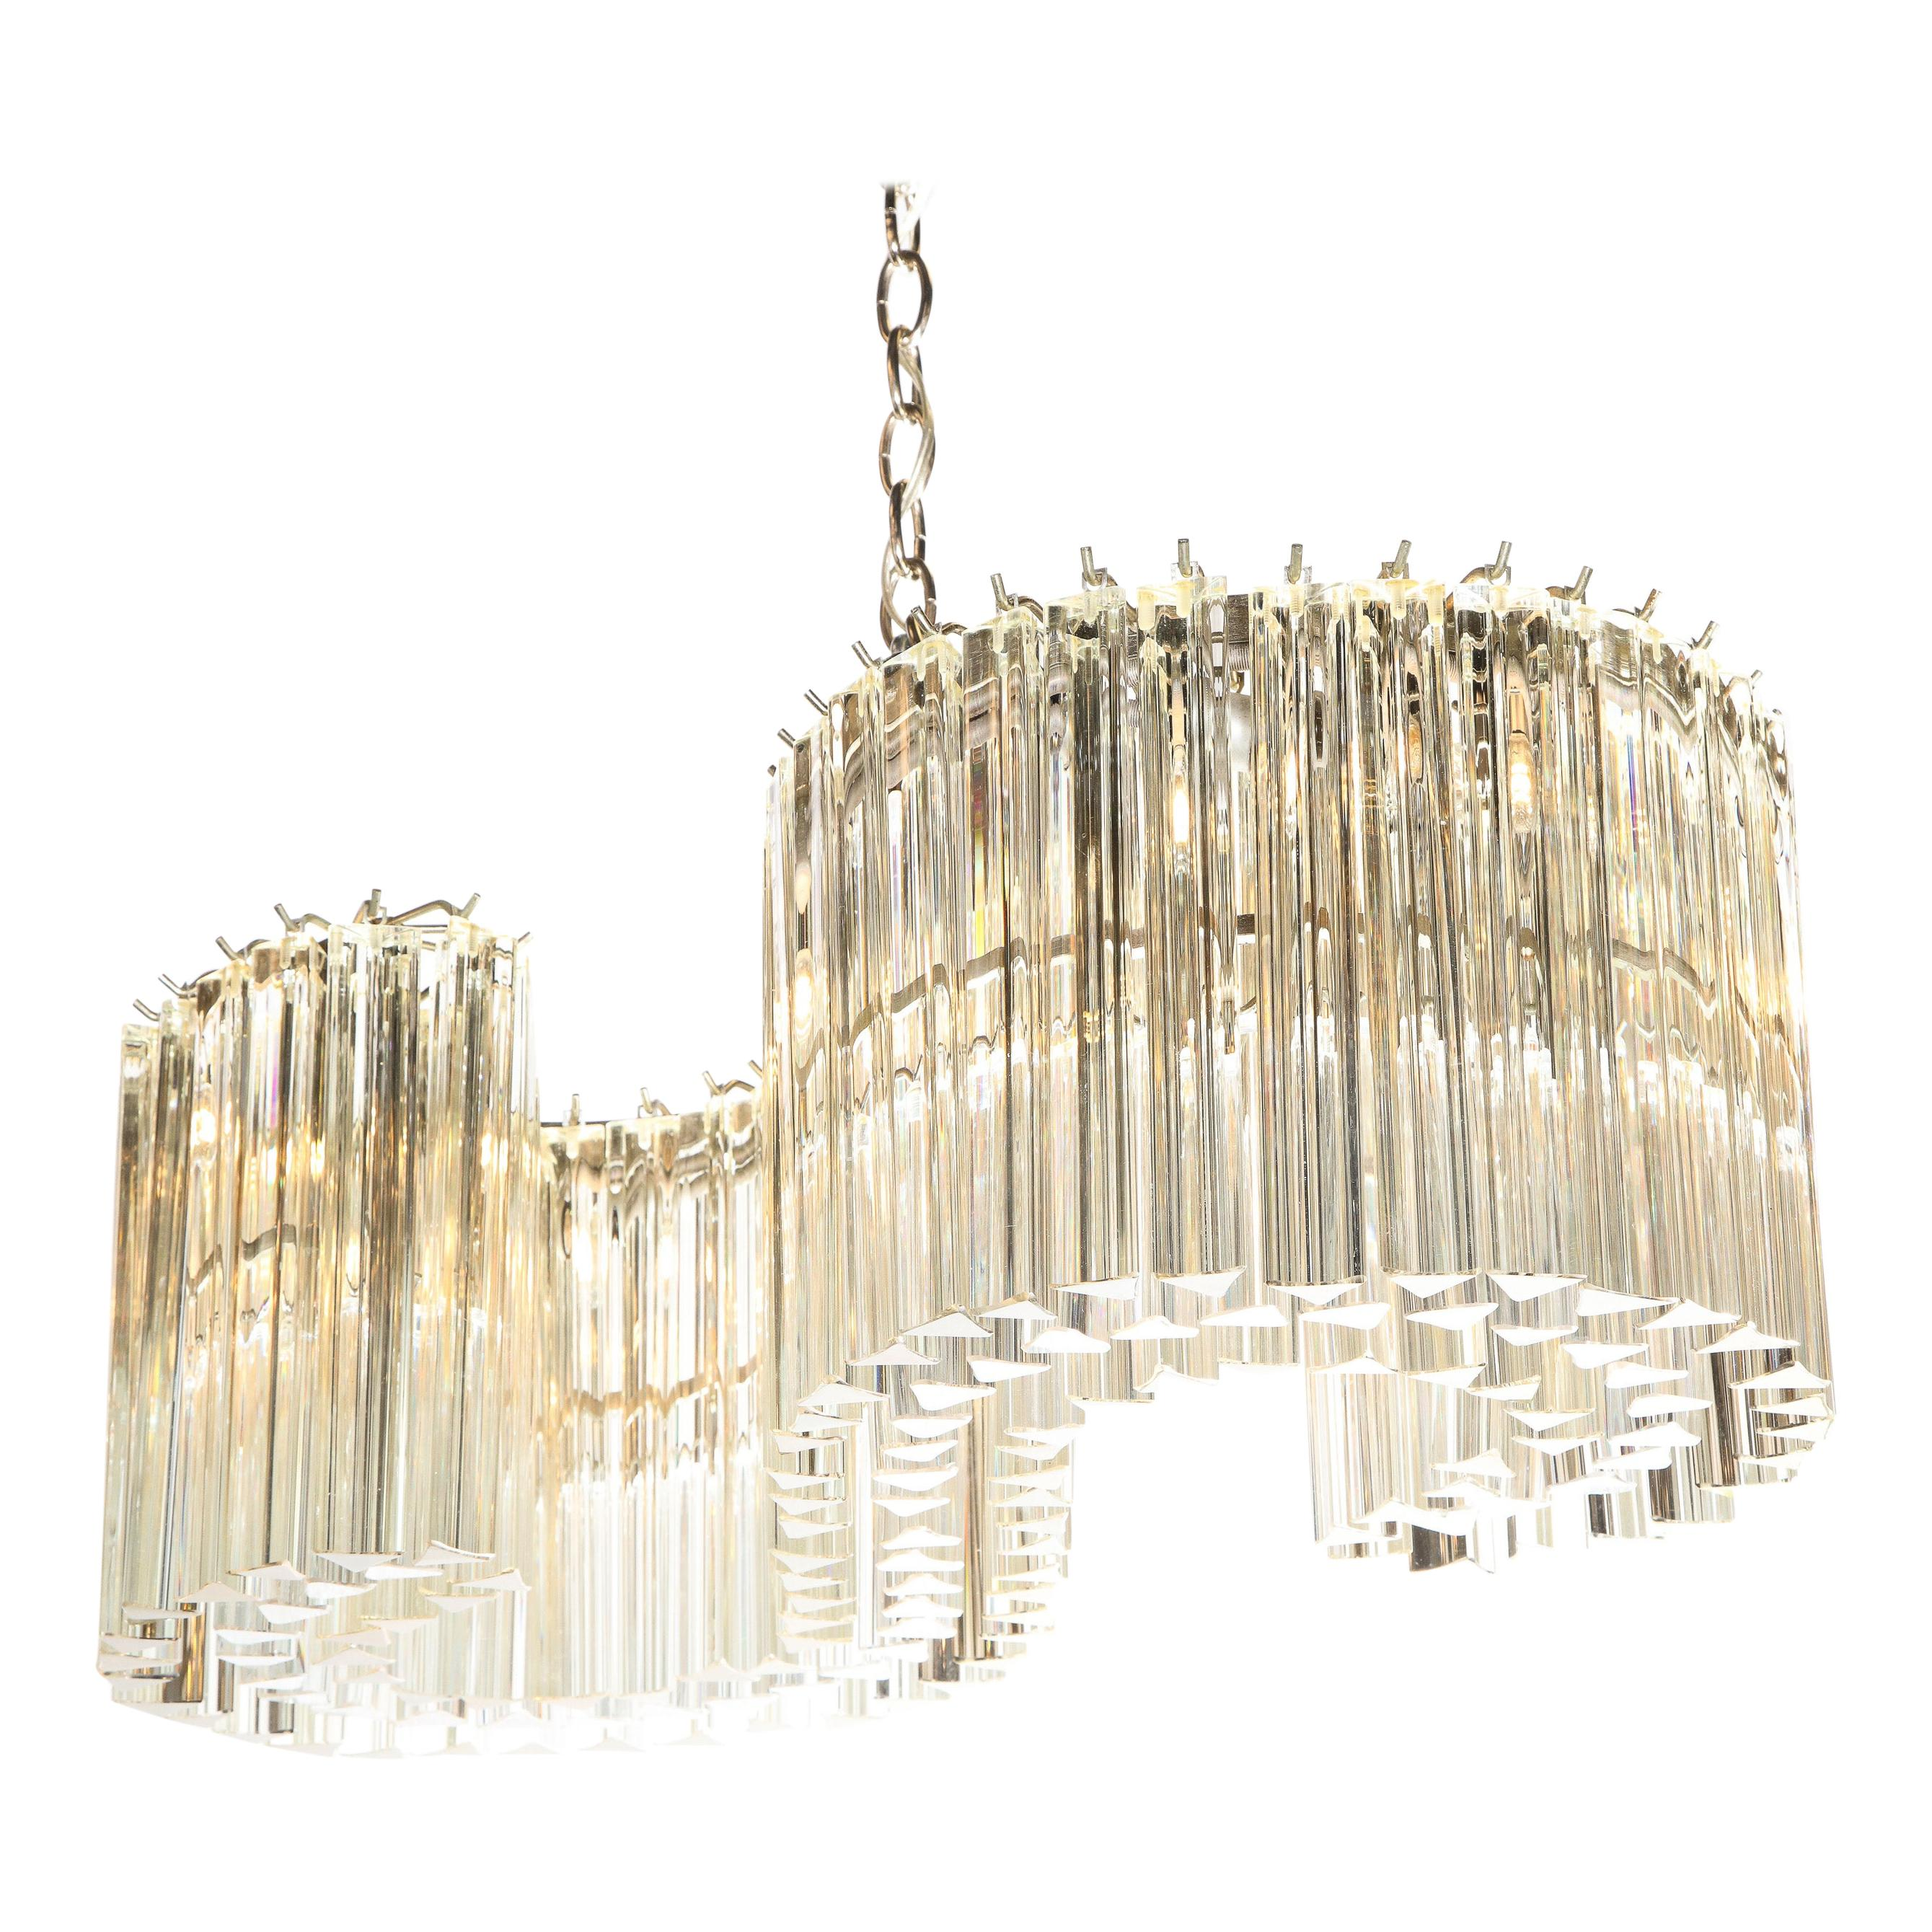 Mid-Century Modern S-Form Translucent Handblown Murano Glass & Chrome Chandelier